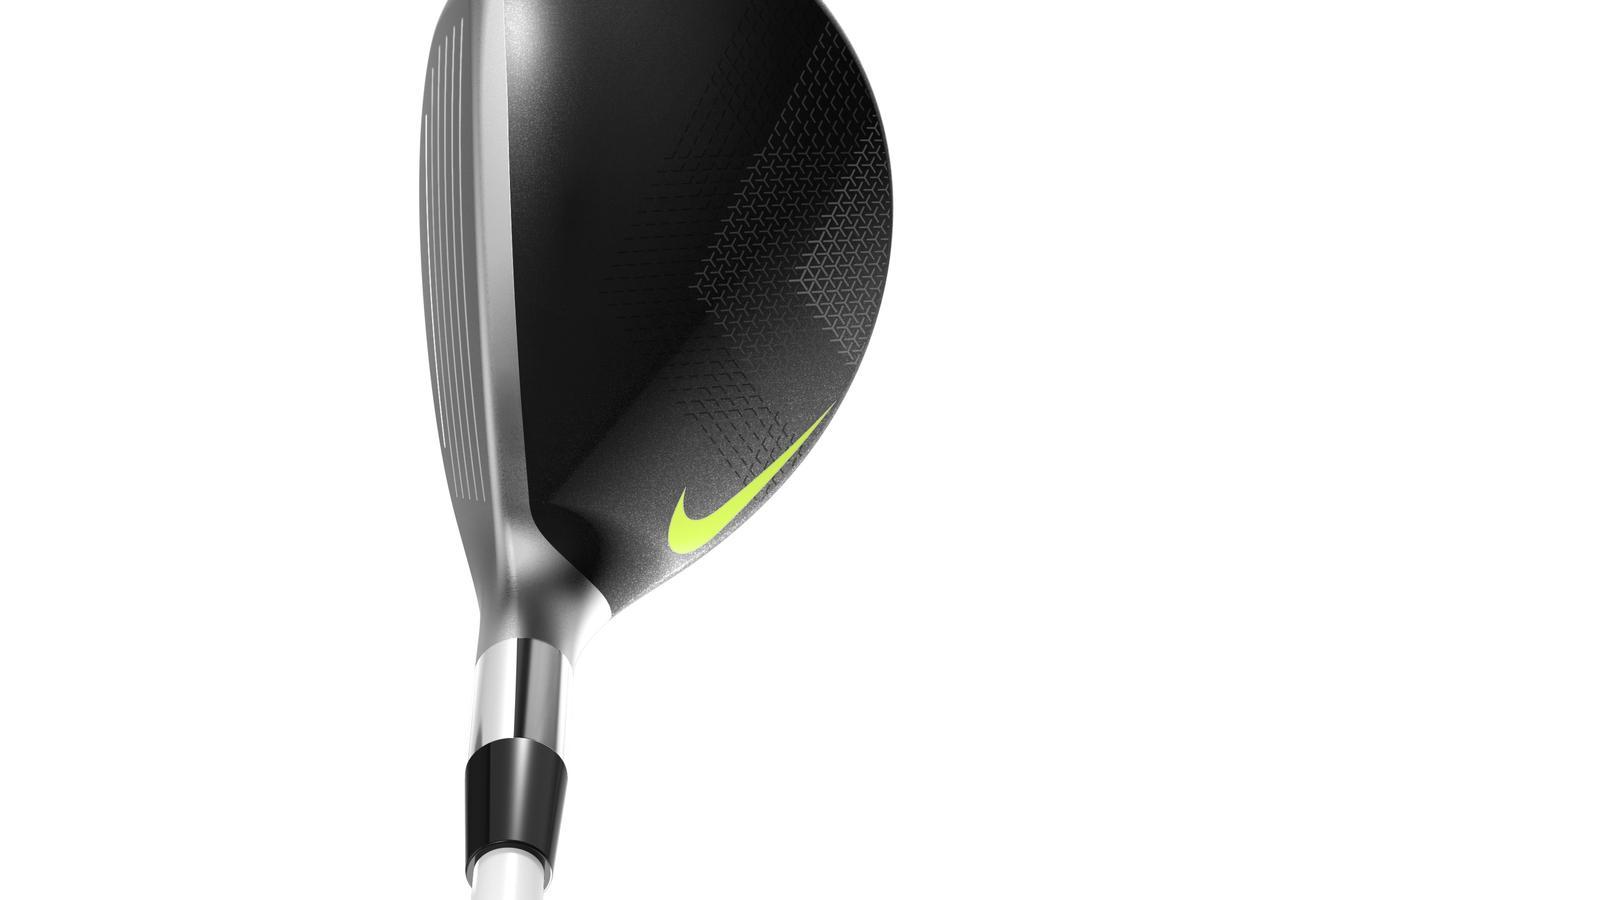 Nike Vapor Speed Hybrid - Address